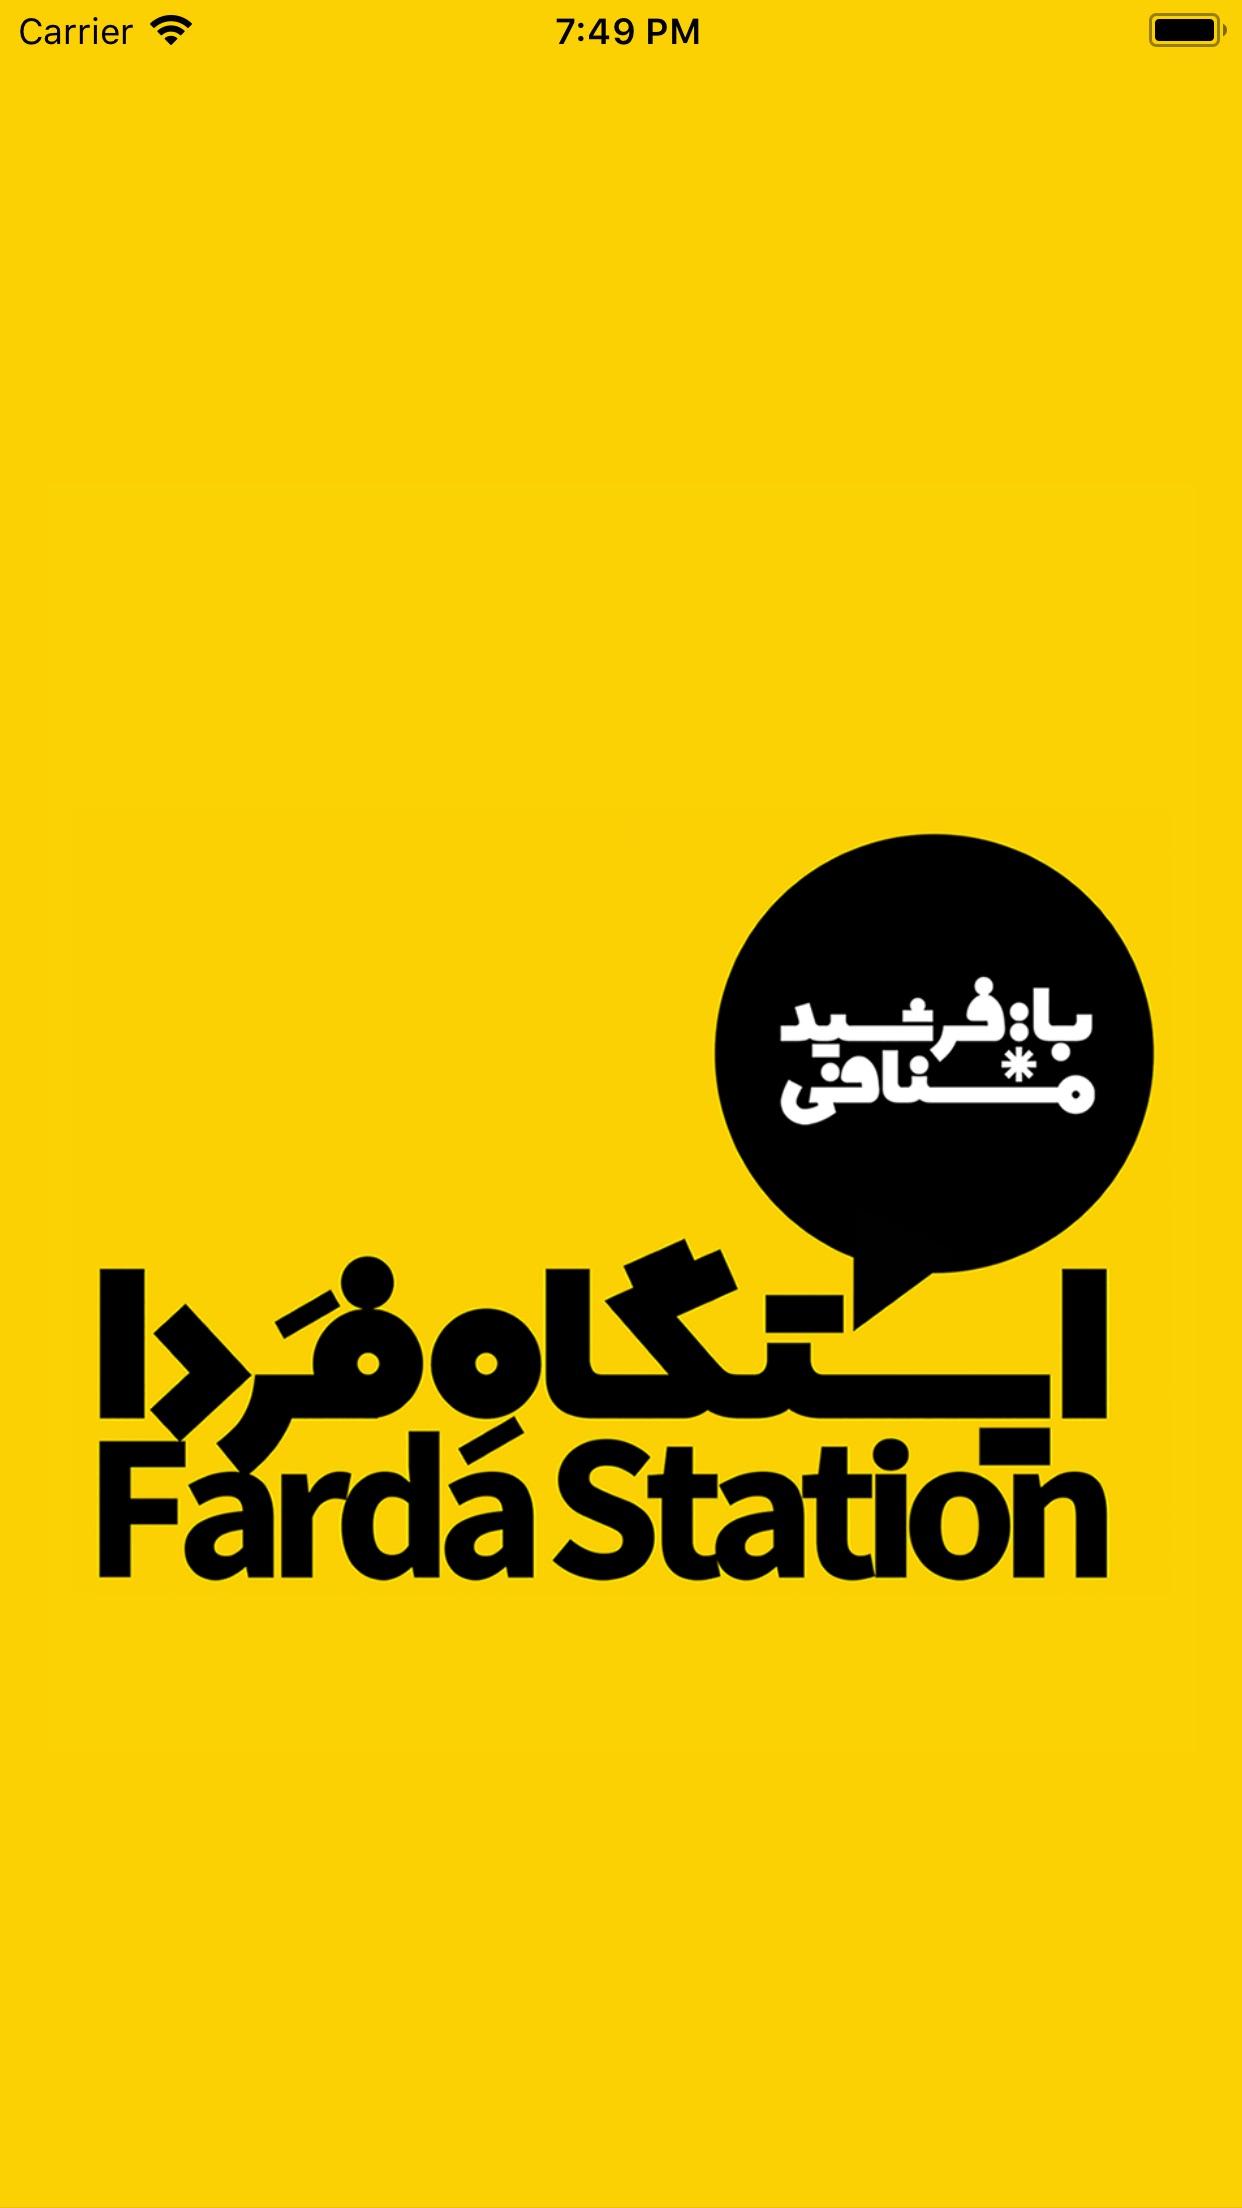 Farda Station - ایستگاه فردا Screenshot